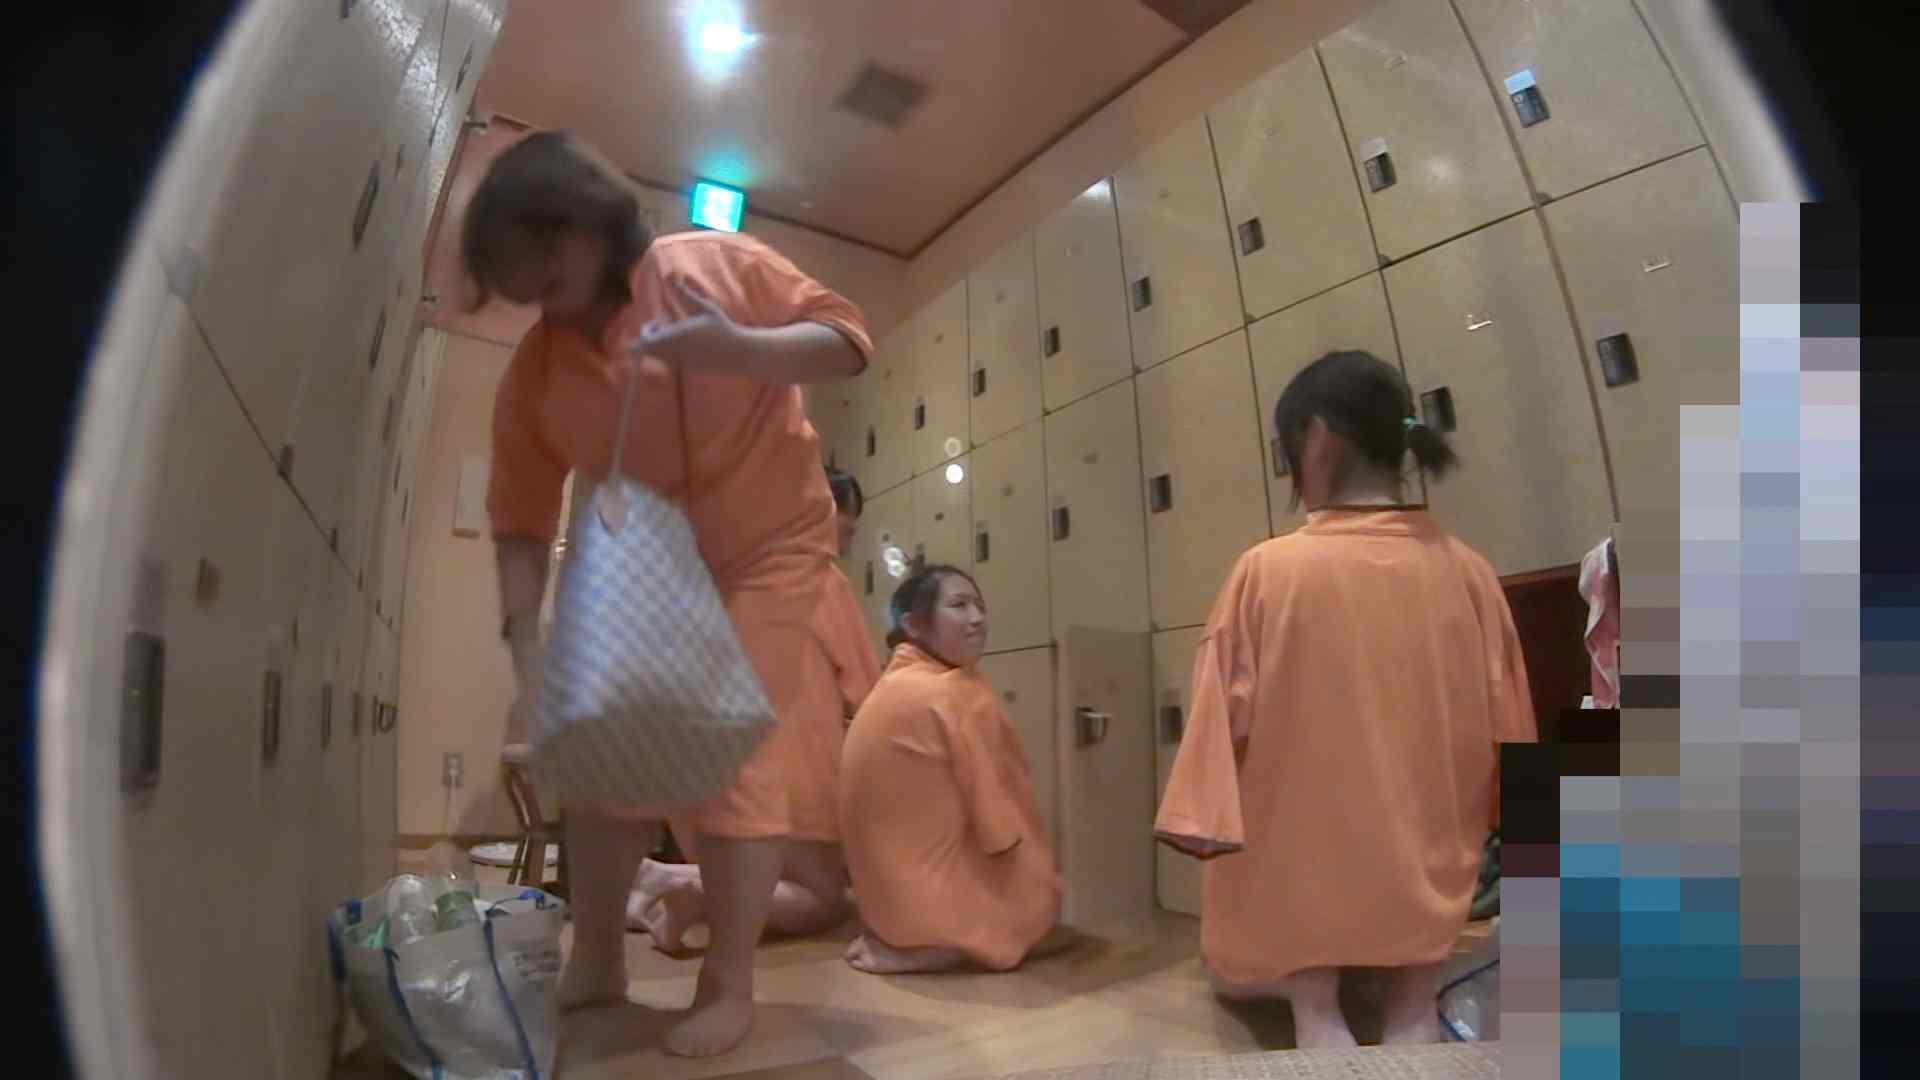 TG.06 「せーの!」で脱ぐ若草仲良し5人組 盗撮 セックス画像 90枚 34